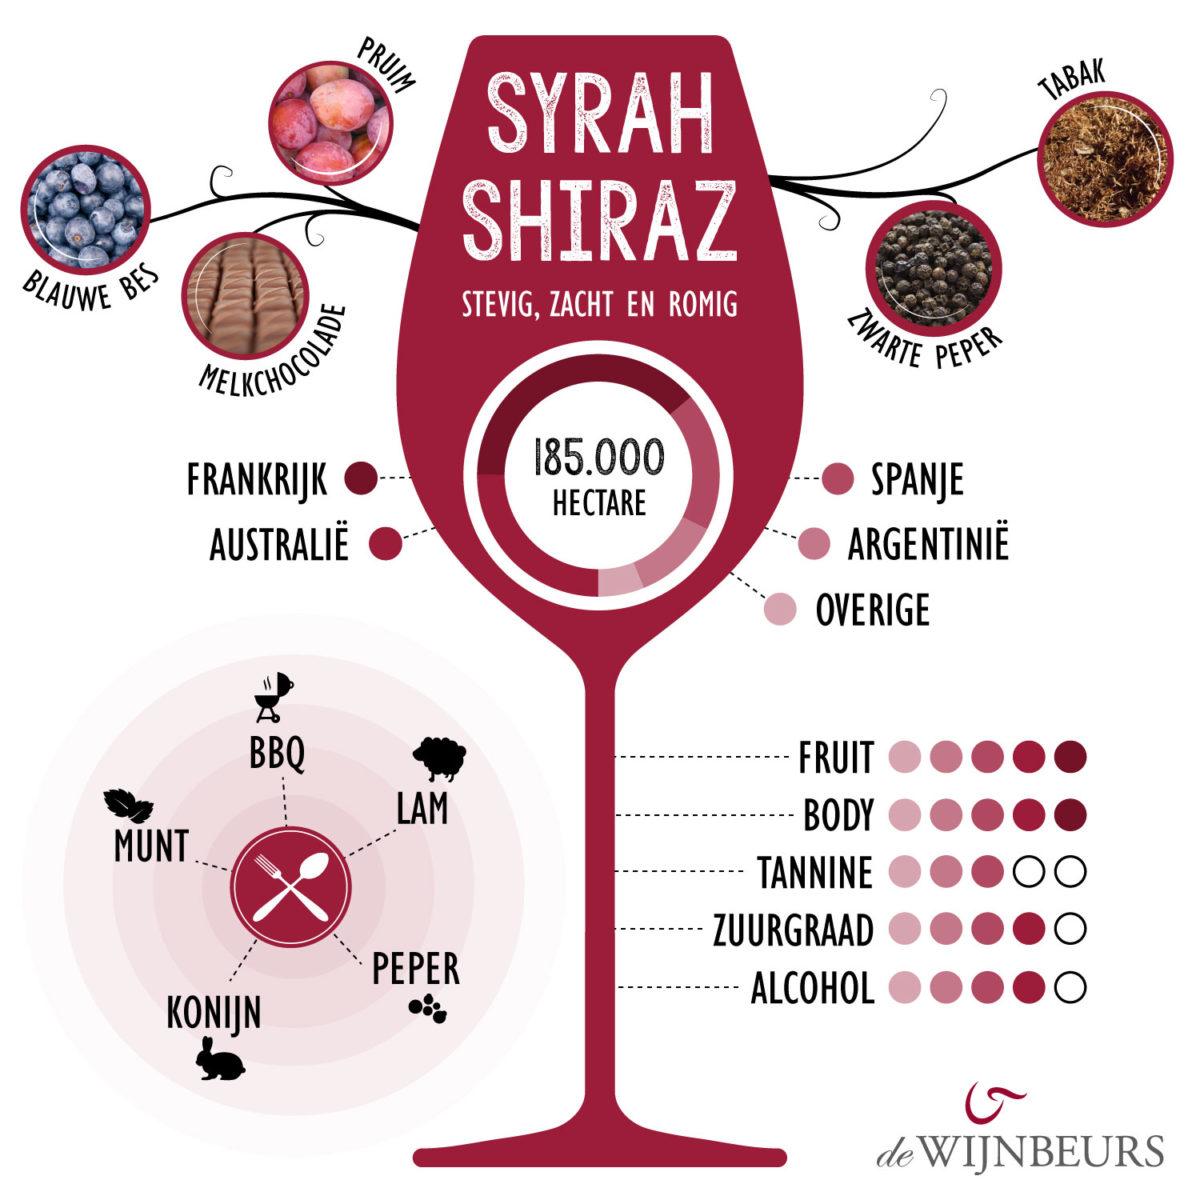 wijnbeurs infographic syrah/shiraz